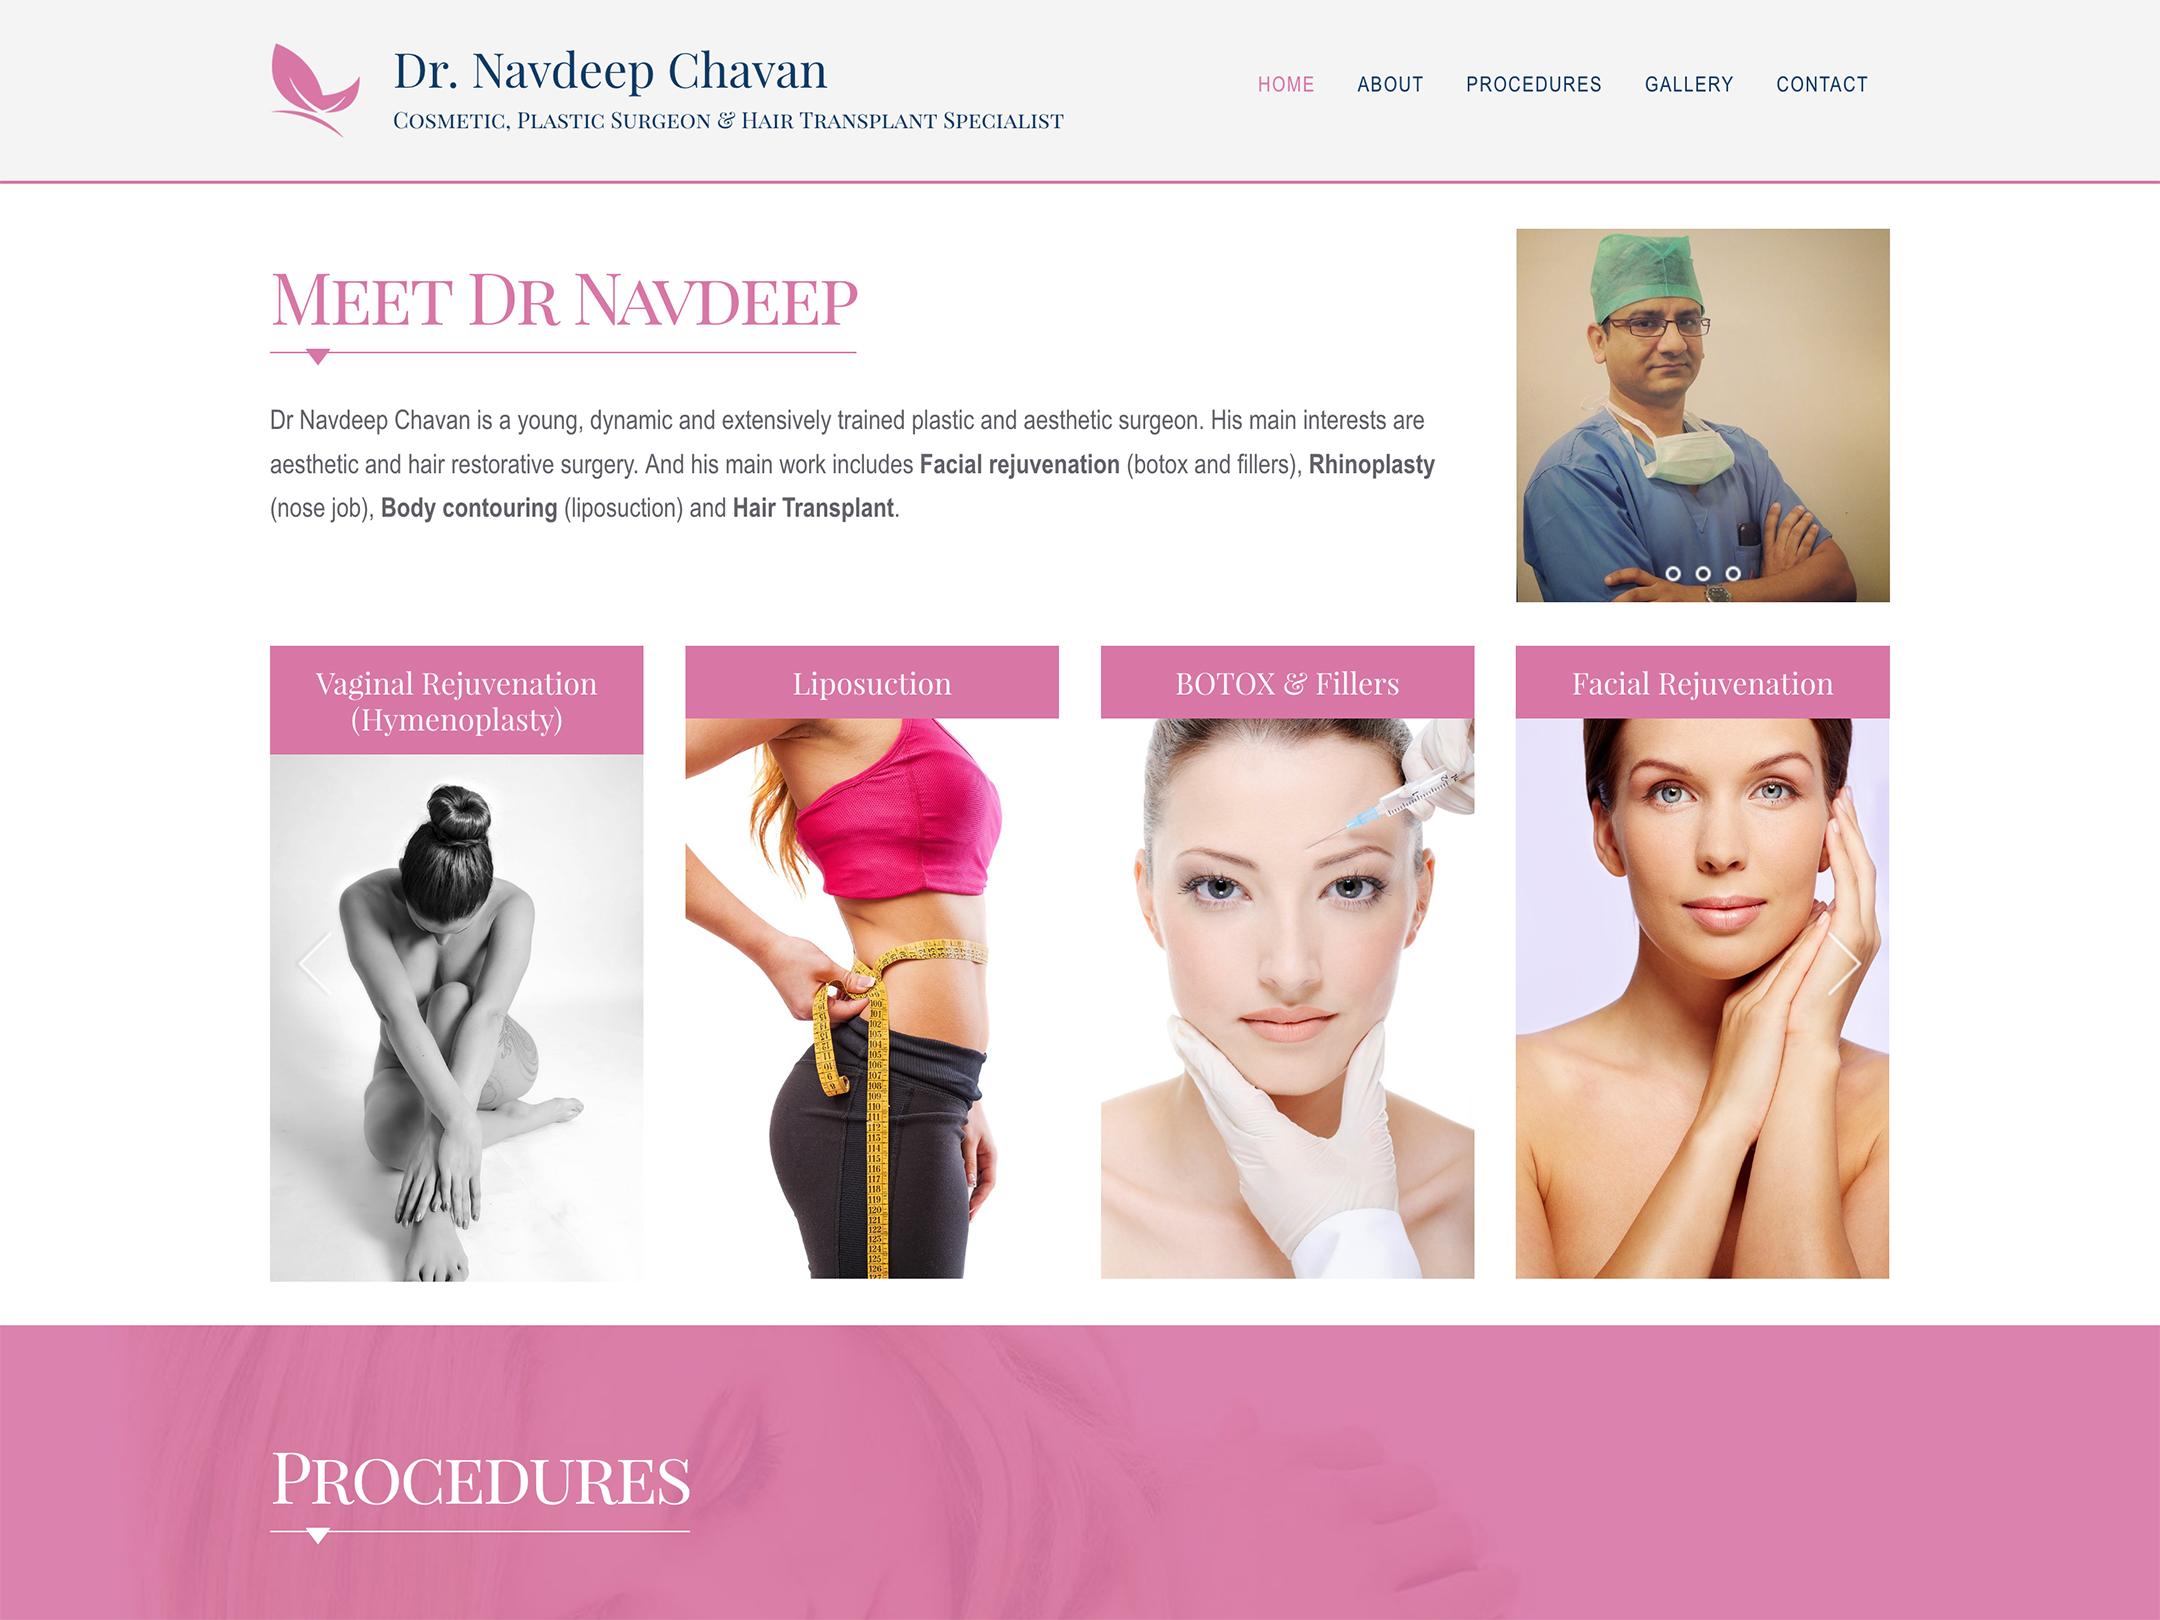 complete website design for dr navdeep chavan